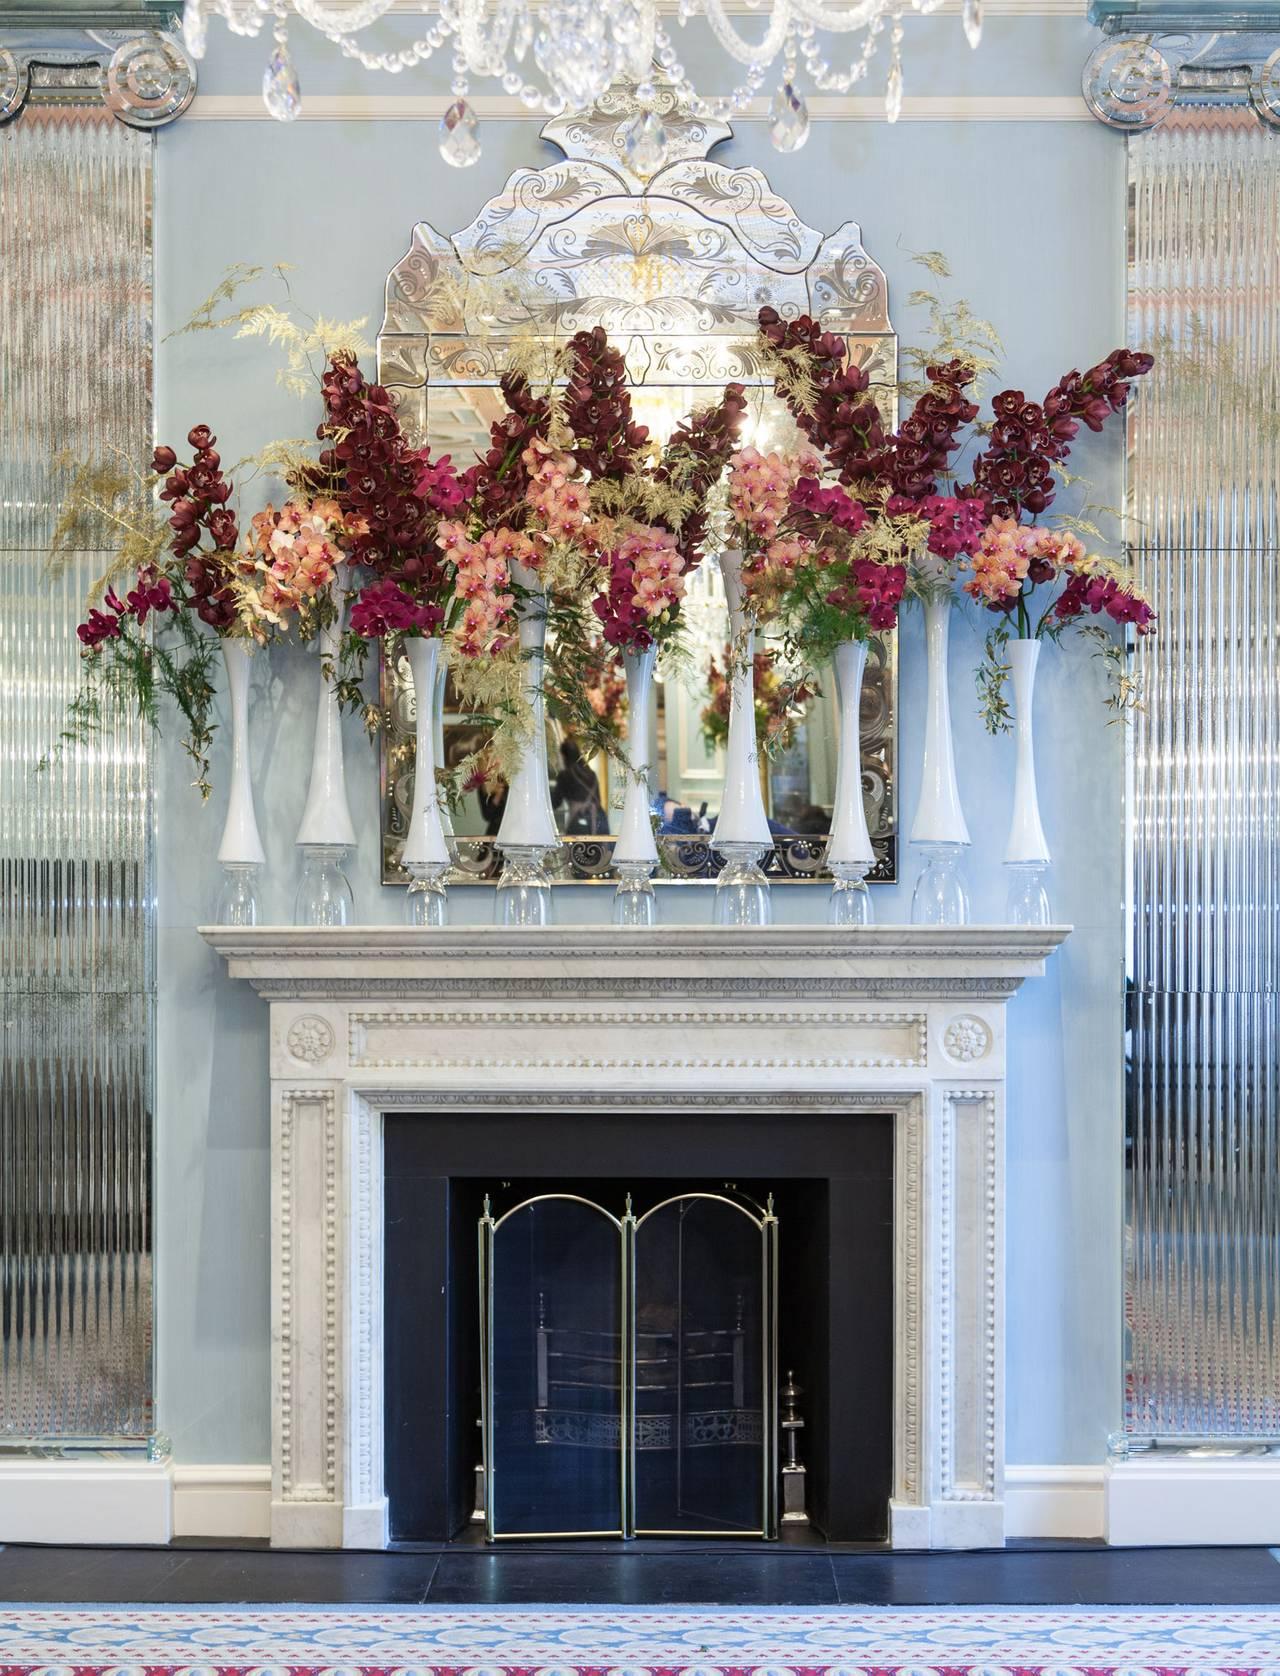 Floral arrangement above fireplace.